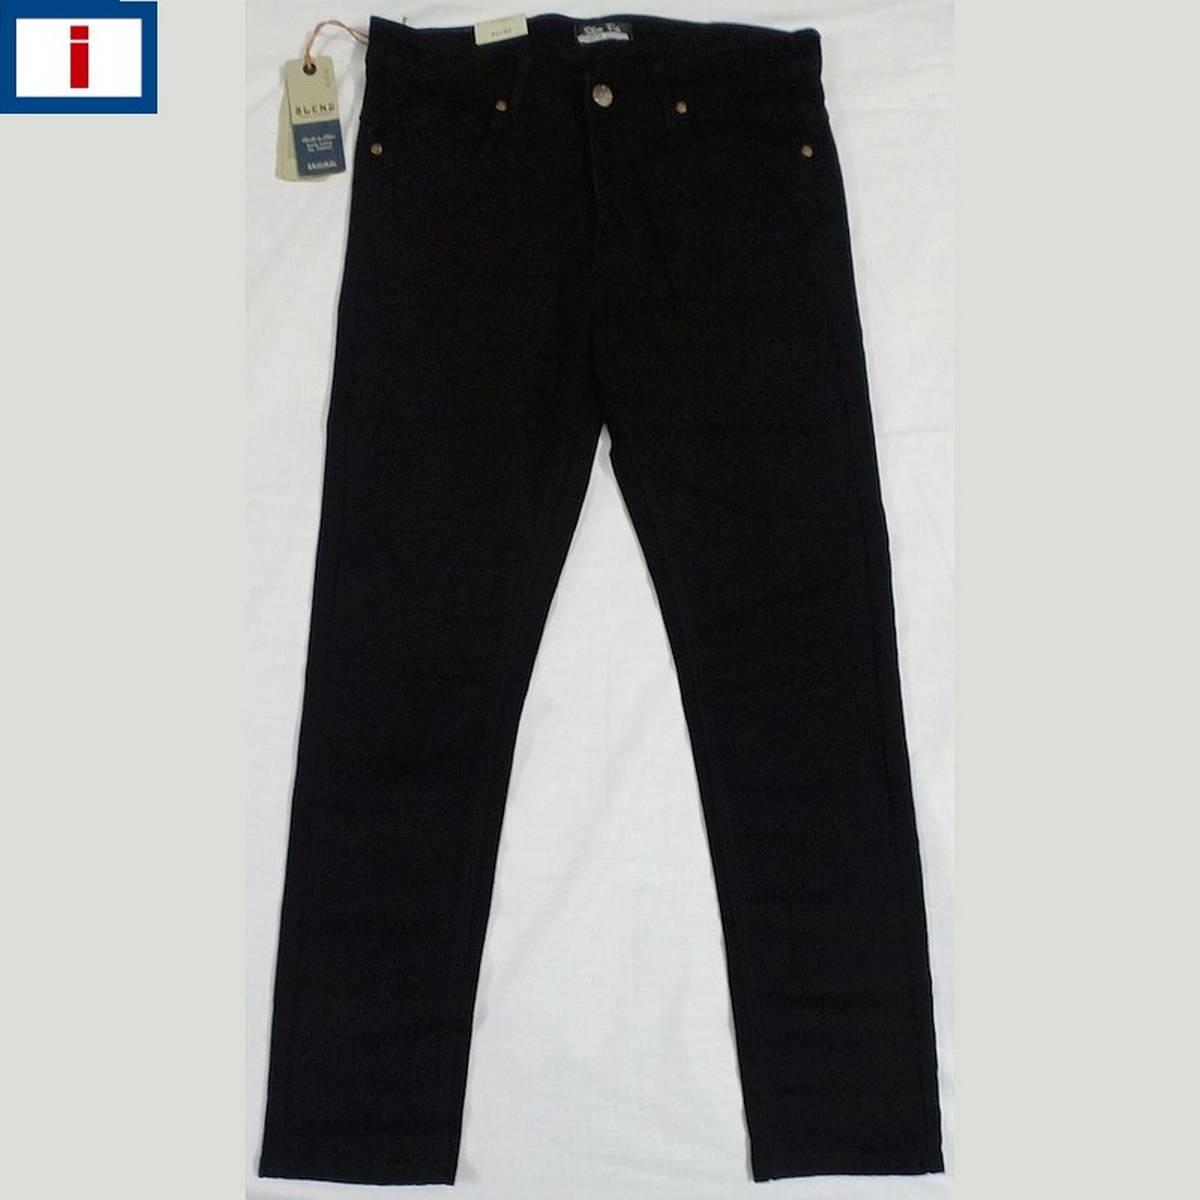 Intelligentsia - Mens Slim Fit Jeans (JD-101) - (Jet Black) - A Grade Premium Quality (Export)